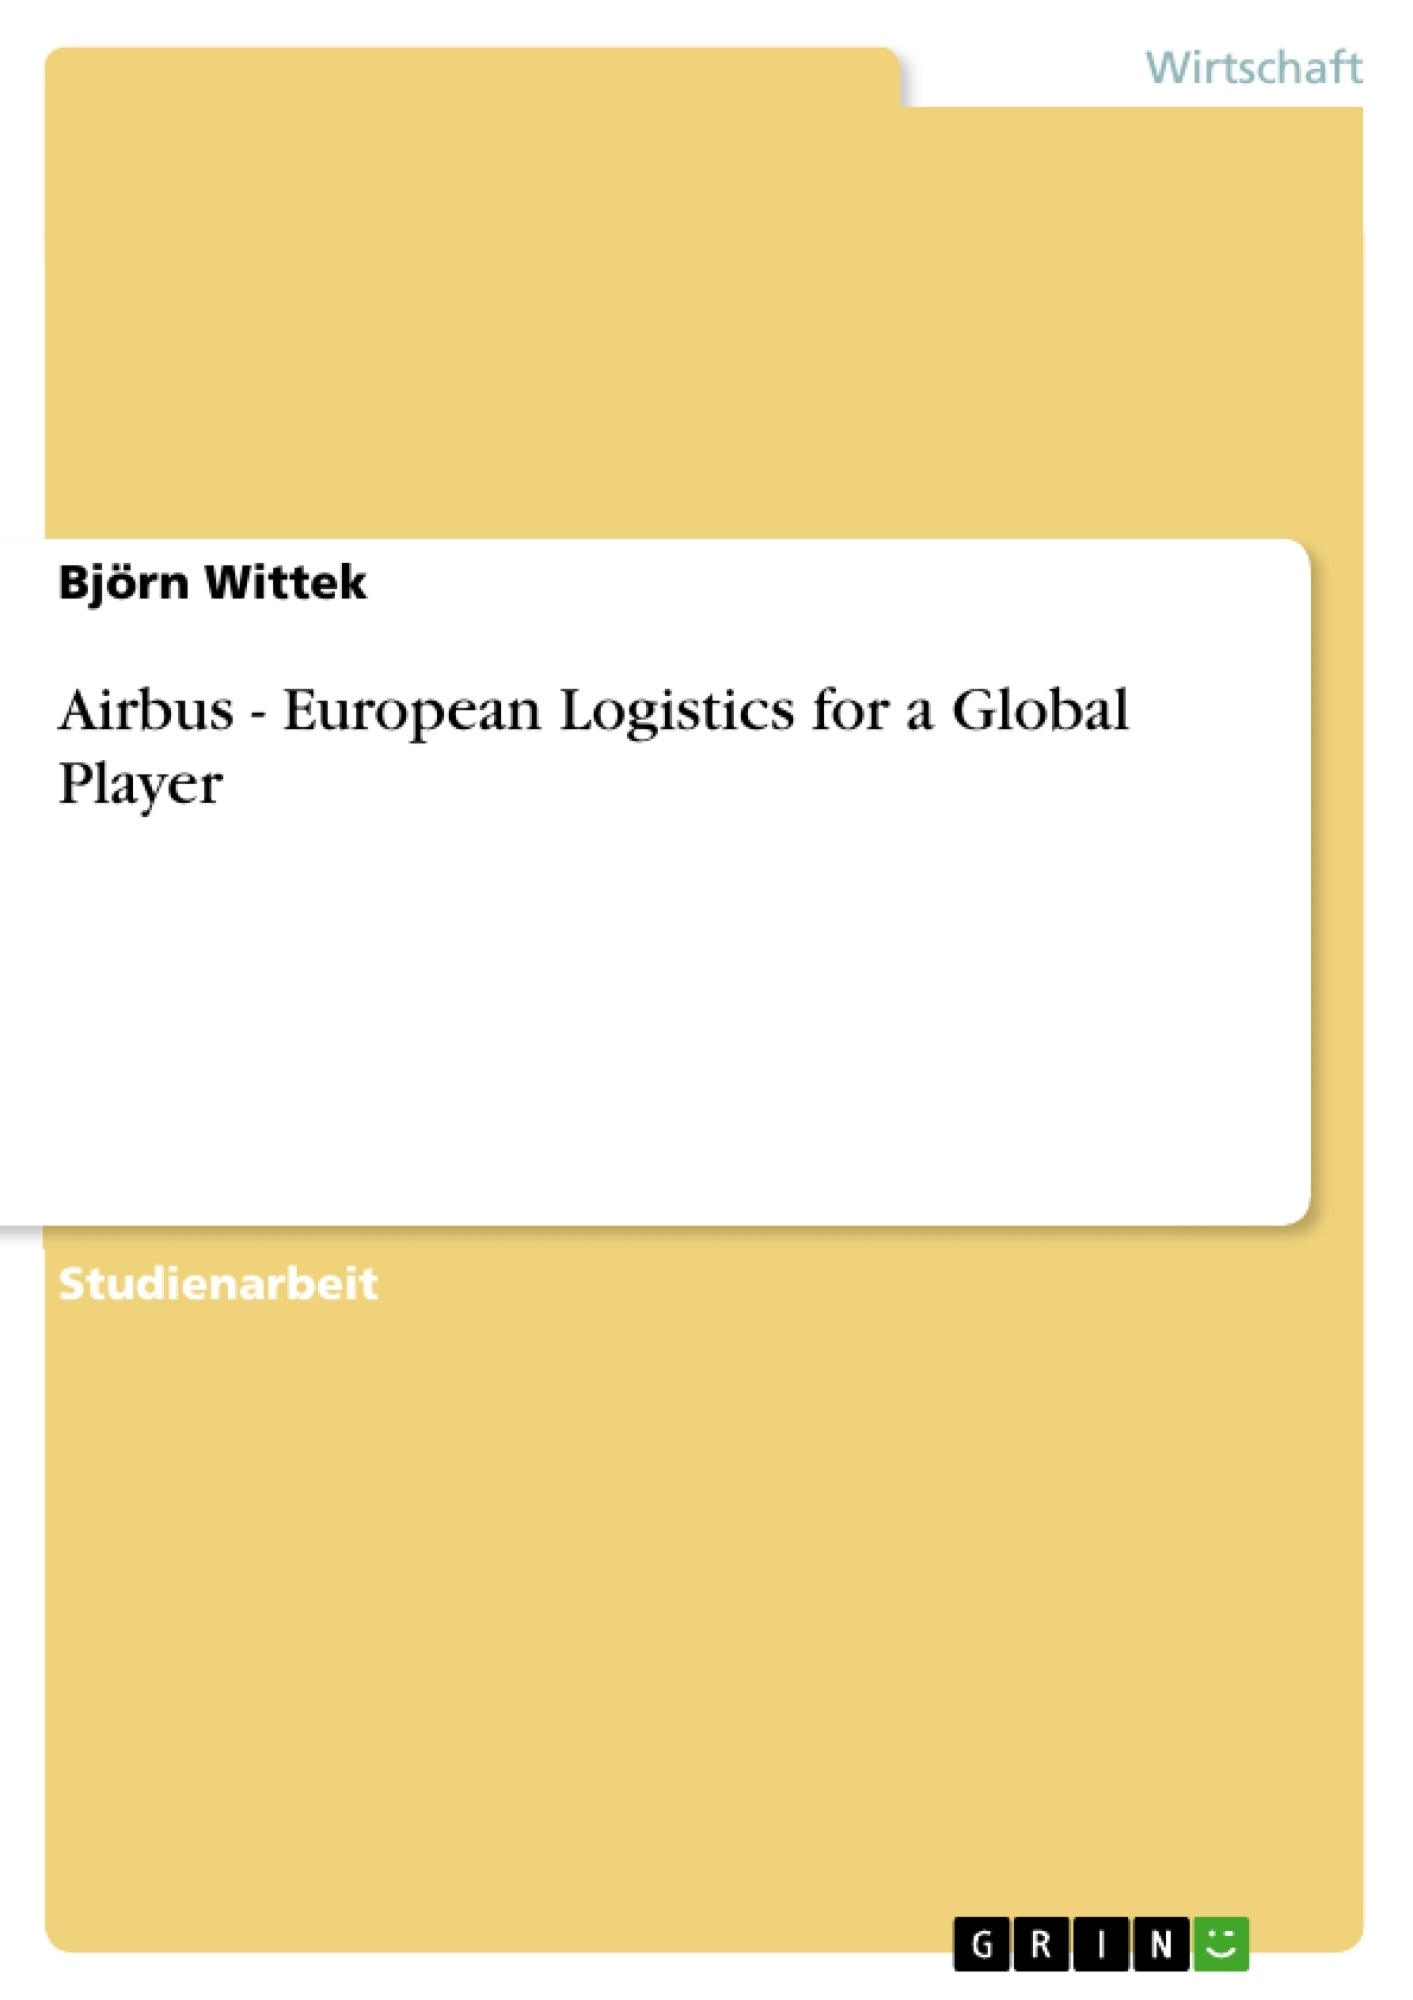 Titel: Airbus - European Logistics for a Global Player